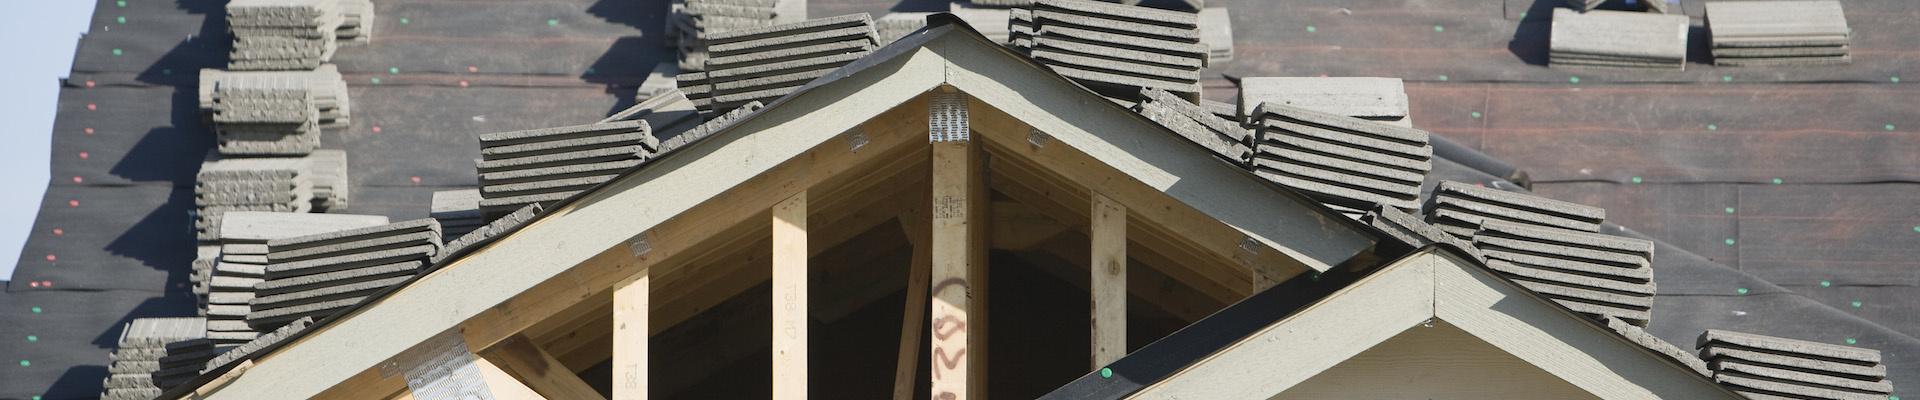 Изграждане на нови покриви (снимка)